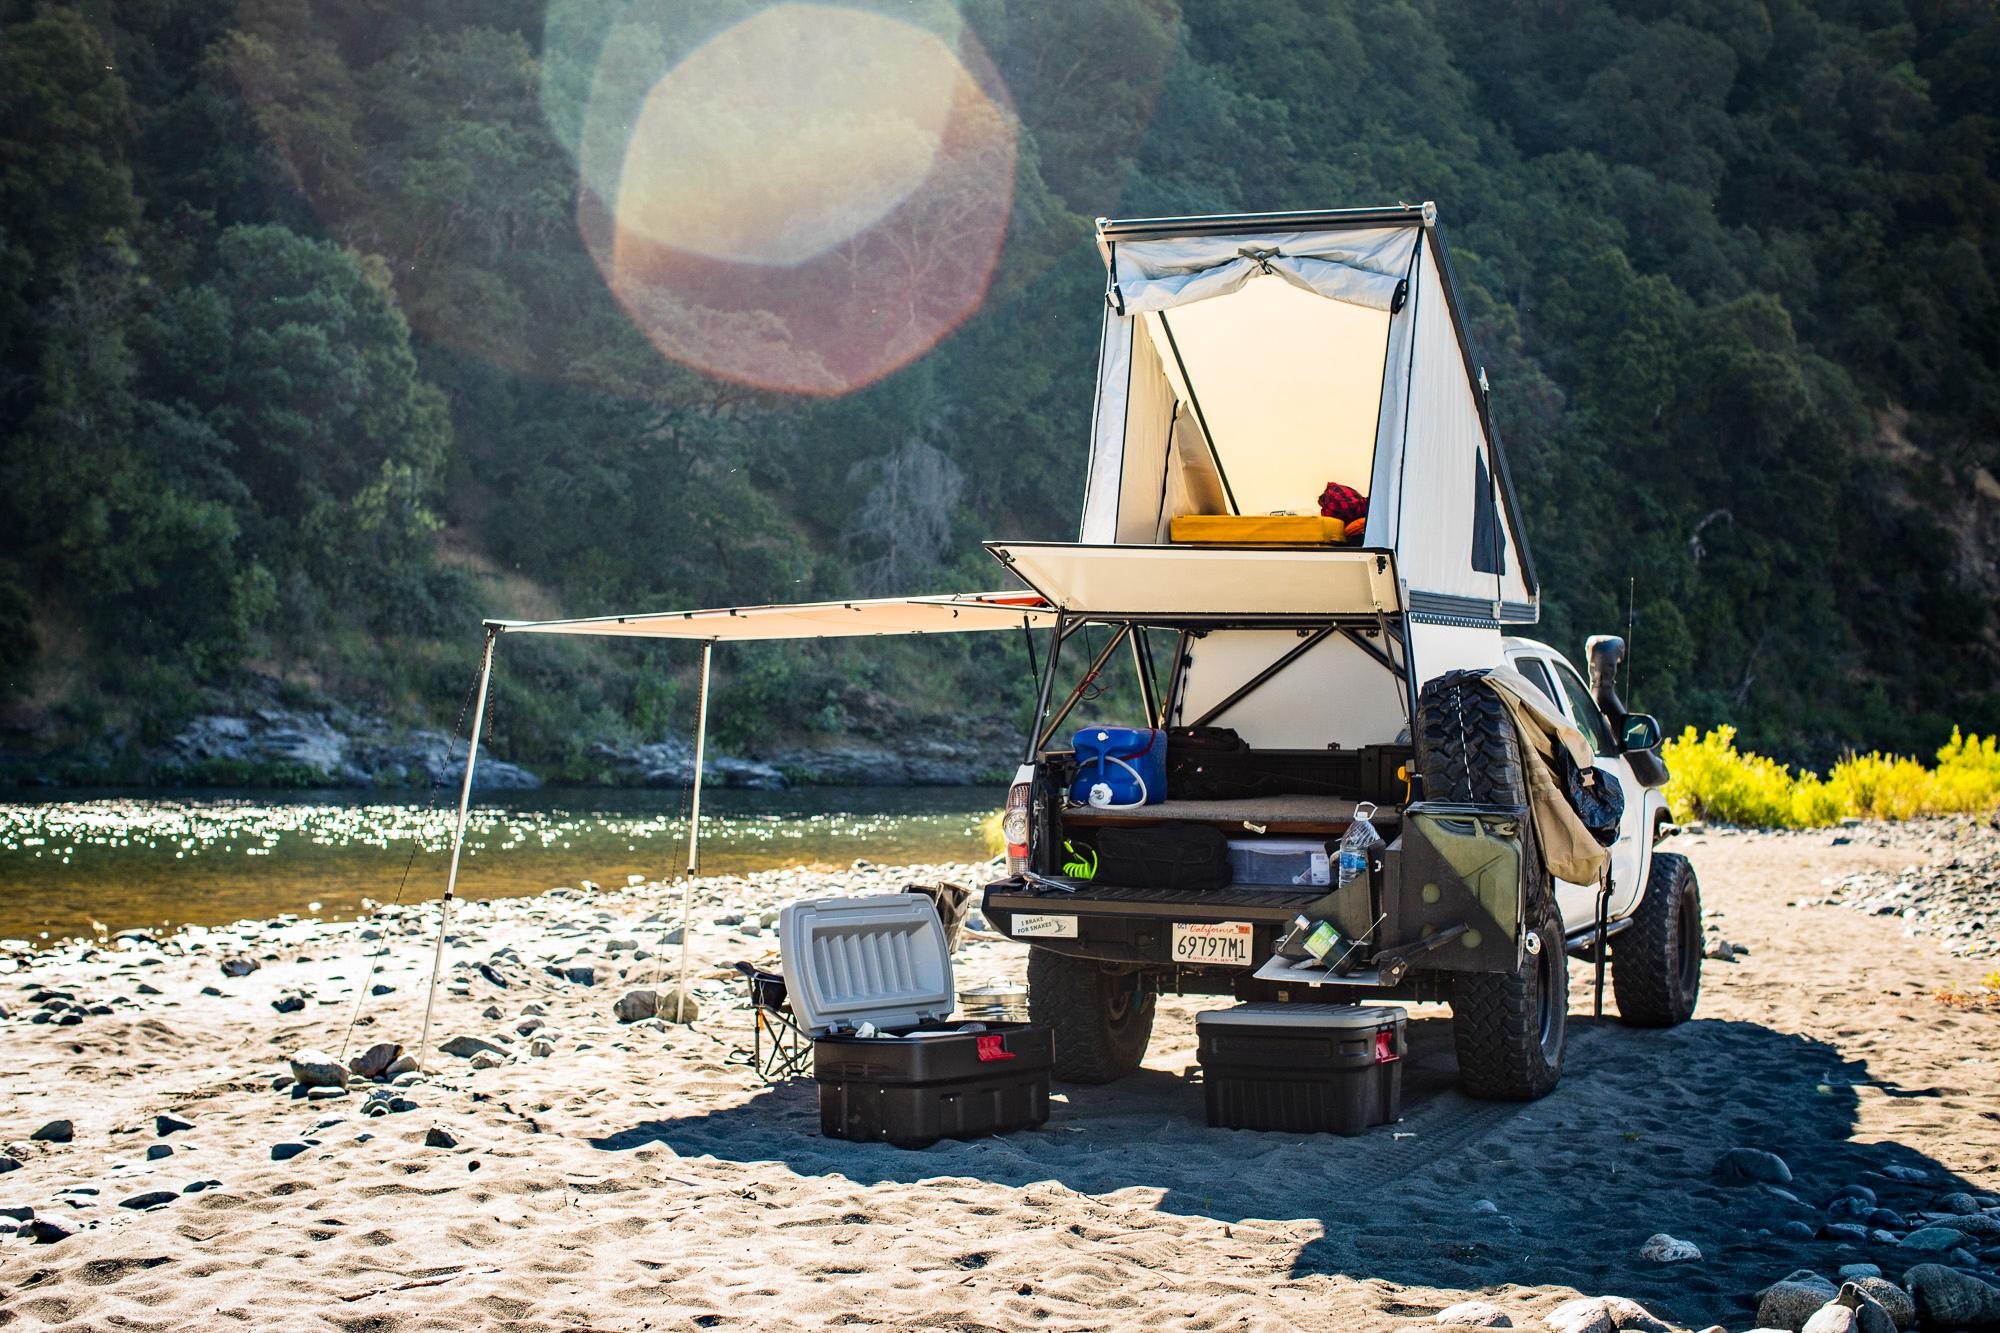 Life in a Go Fast Camper